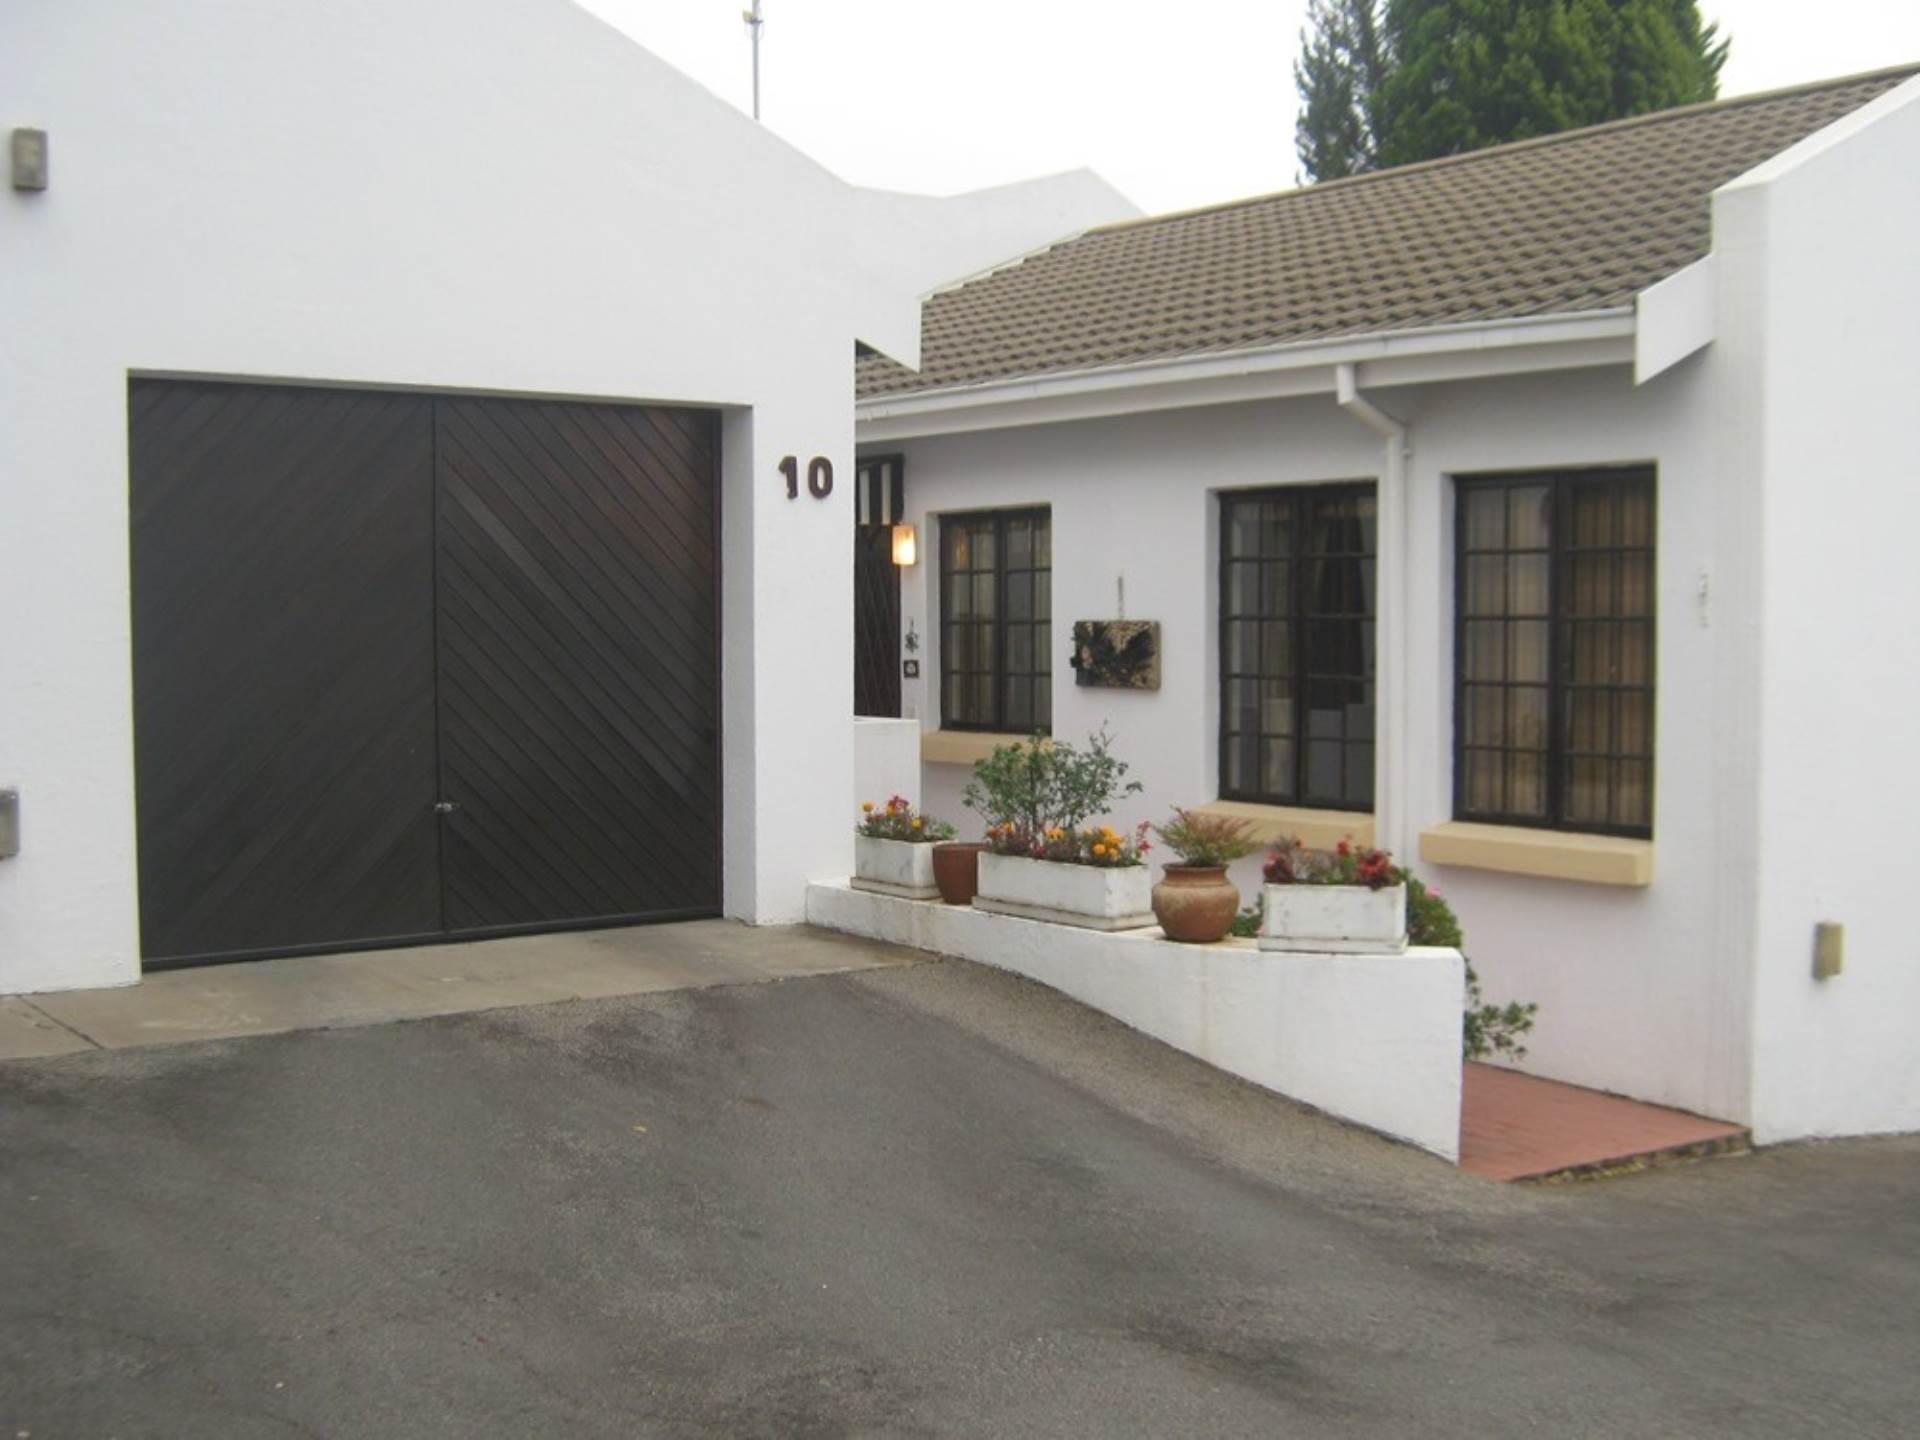 2 BedroomTownhouse To Rent In Bromhof